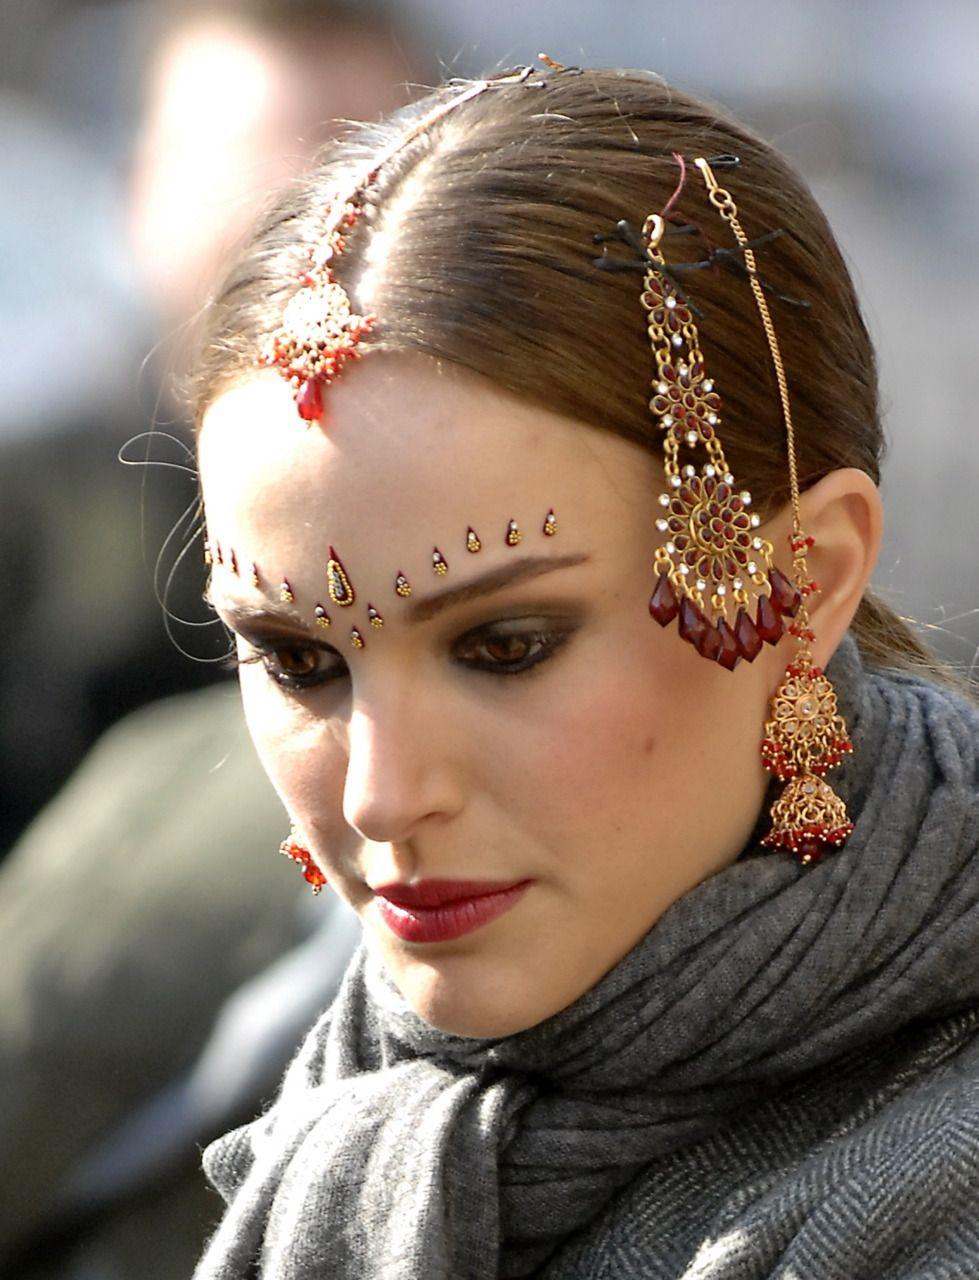 Natalie Portmans New Love